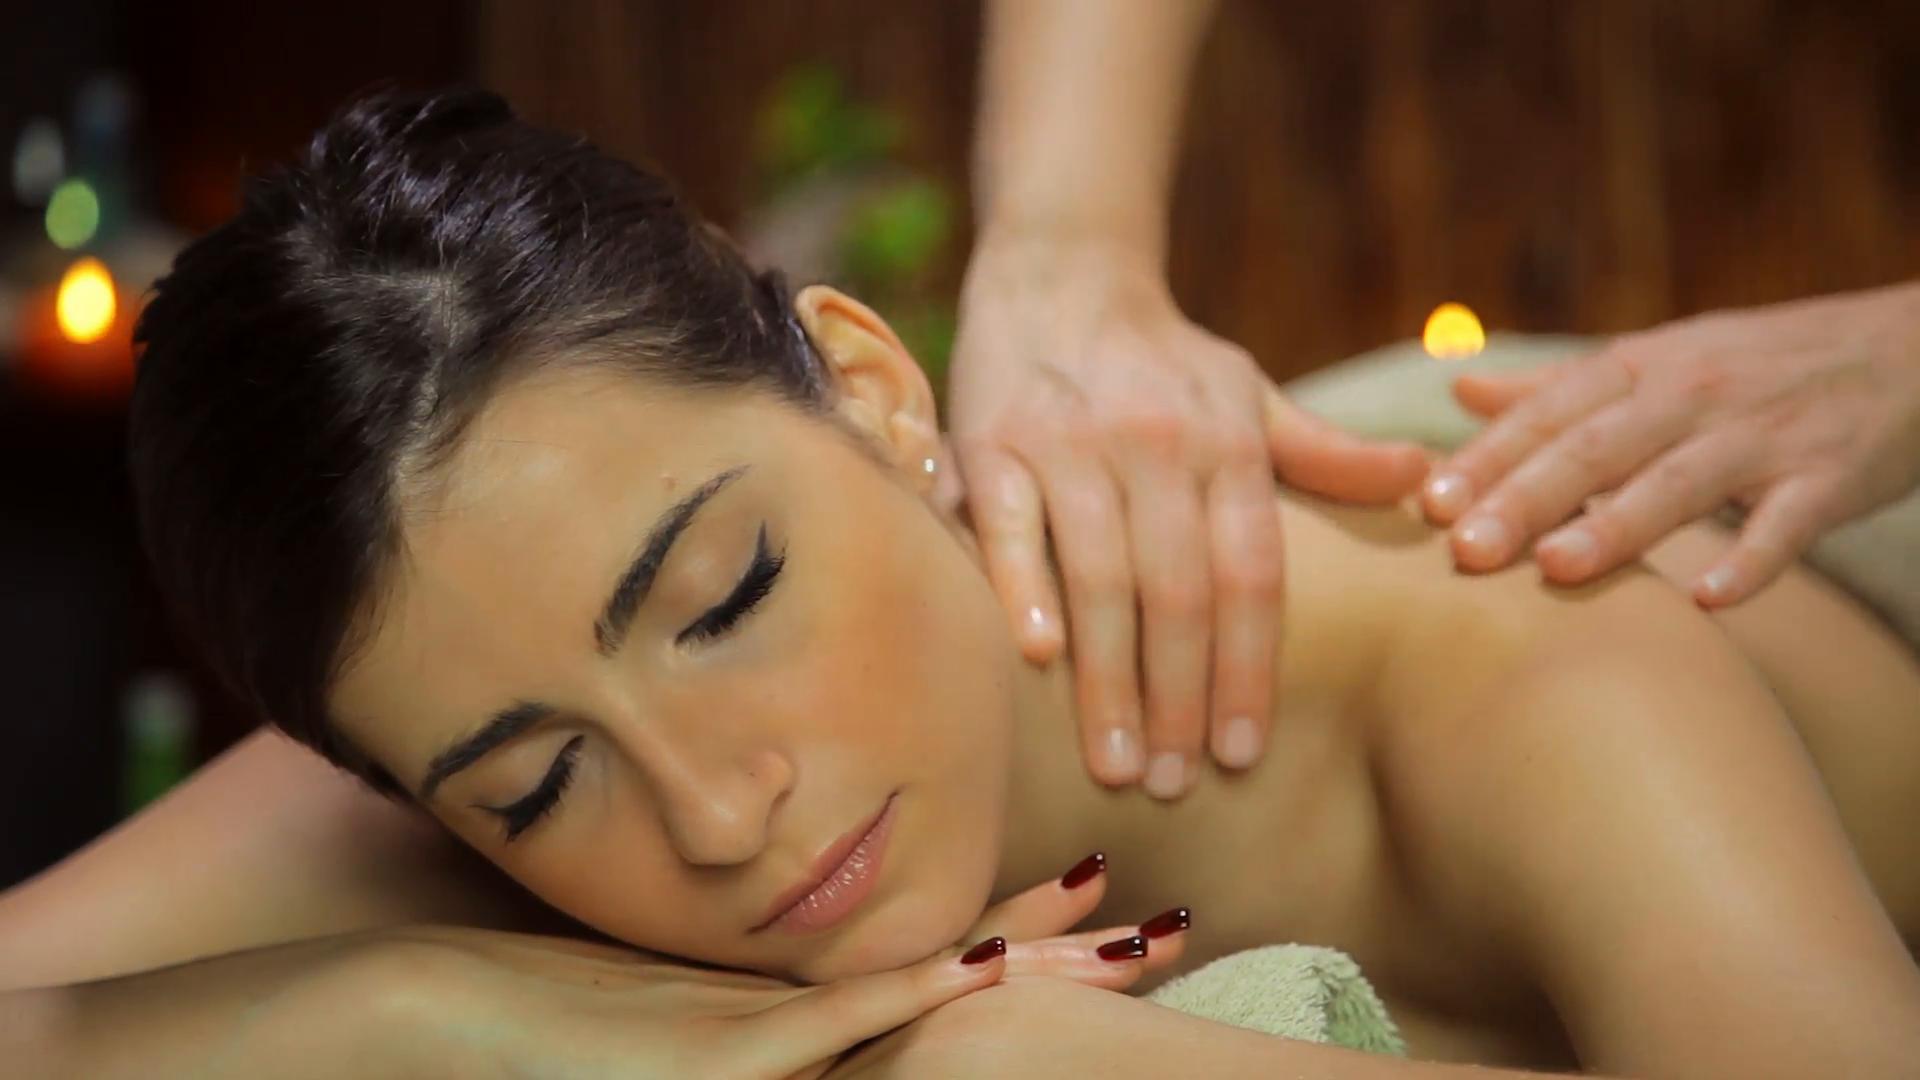 beautiful-woman-relaxing-in-spa-getting-massage-happy_romkkct4__F0012